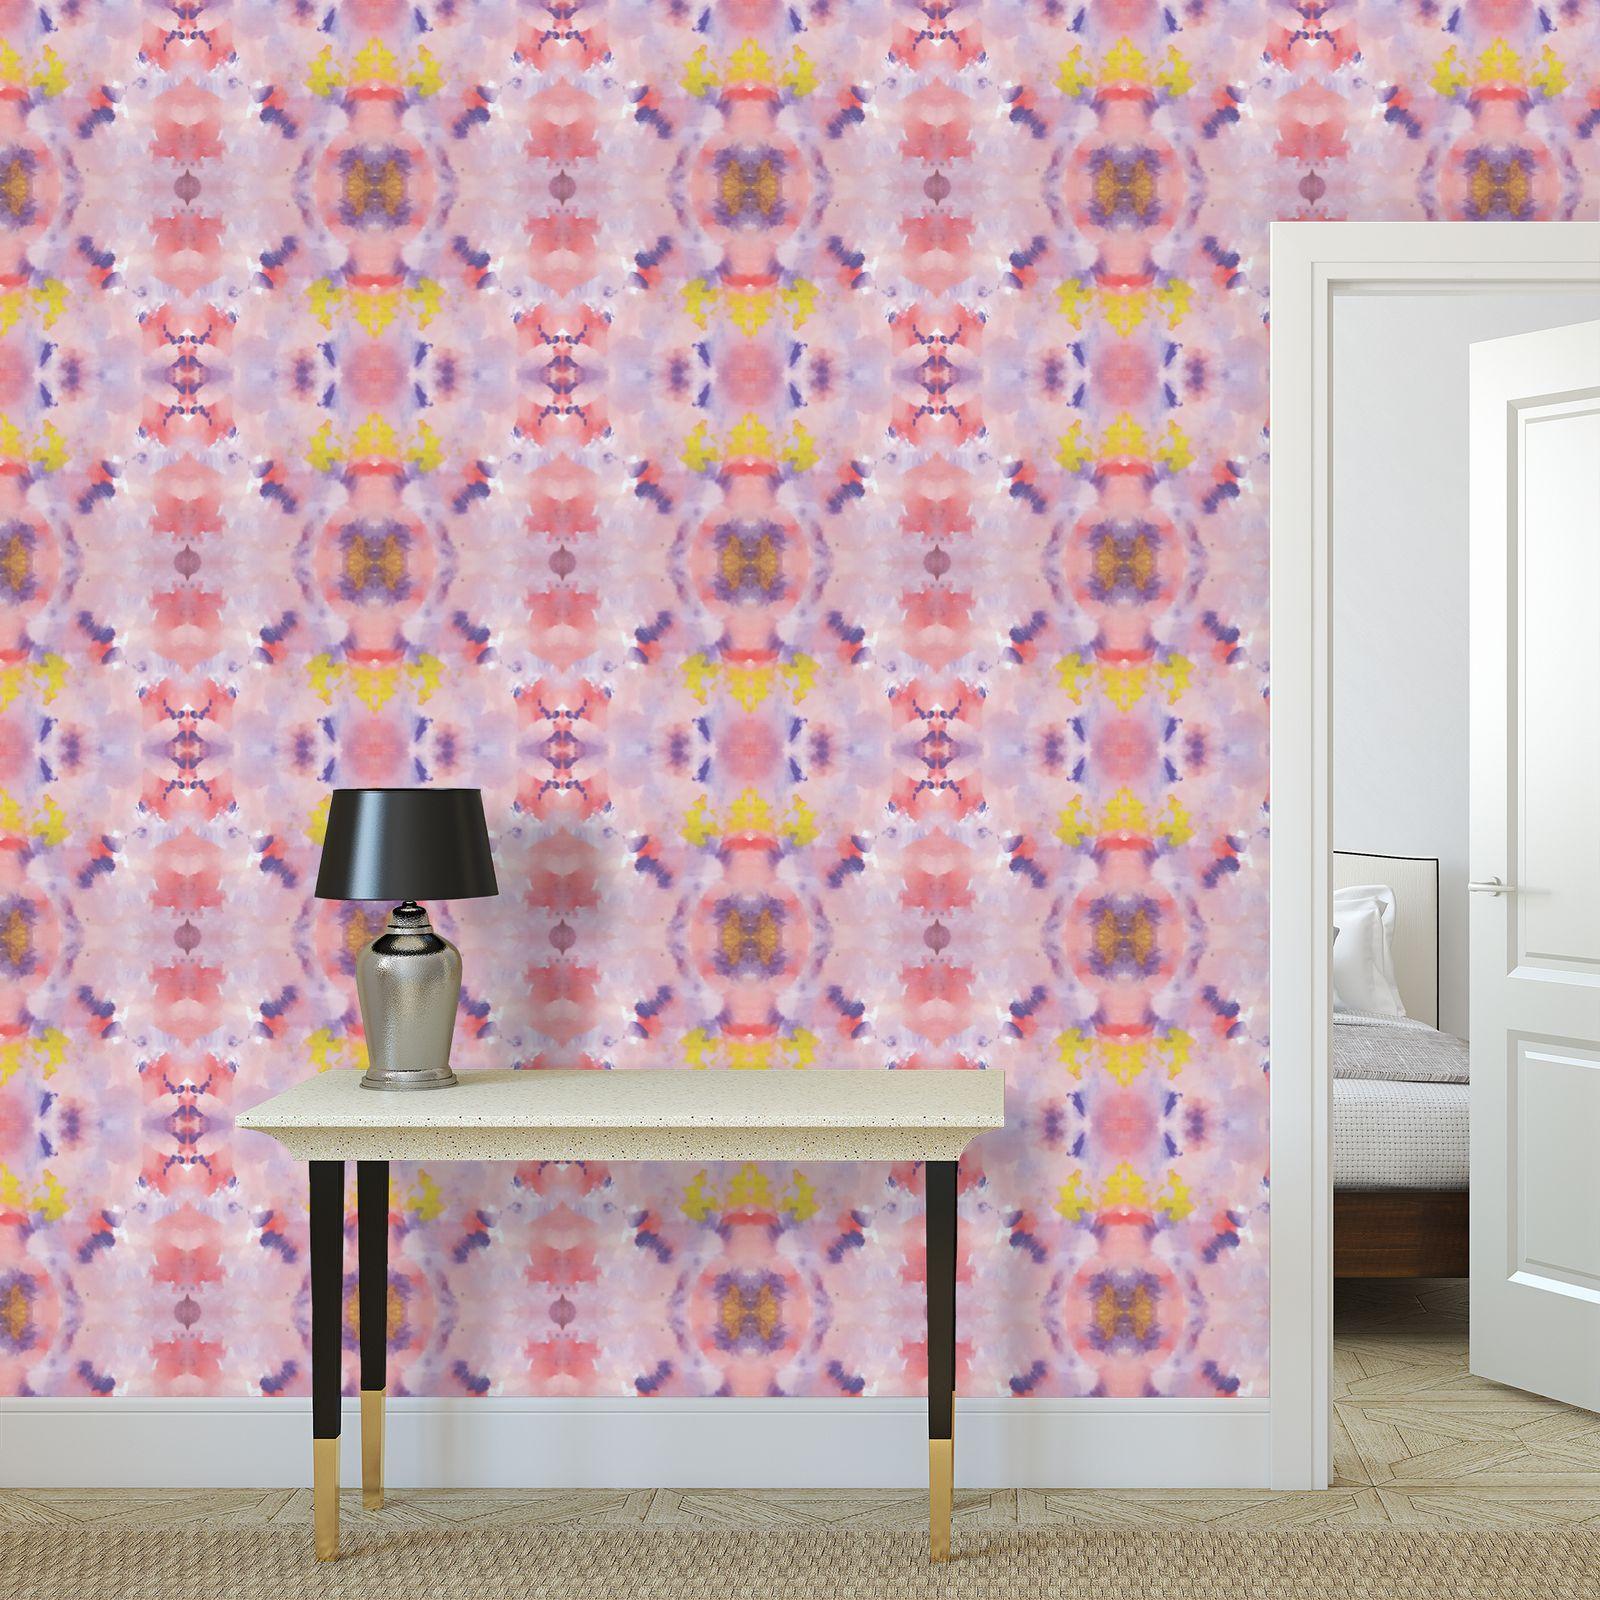 Wallpaper Rolls Painting 31